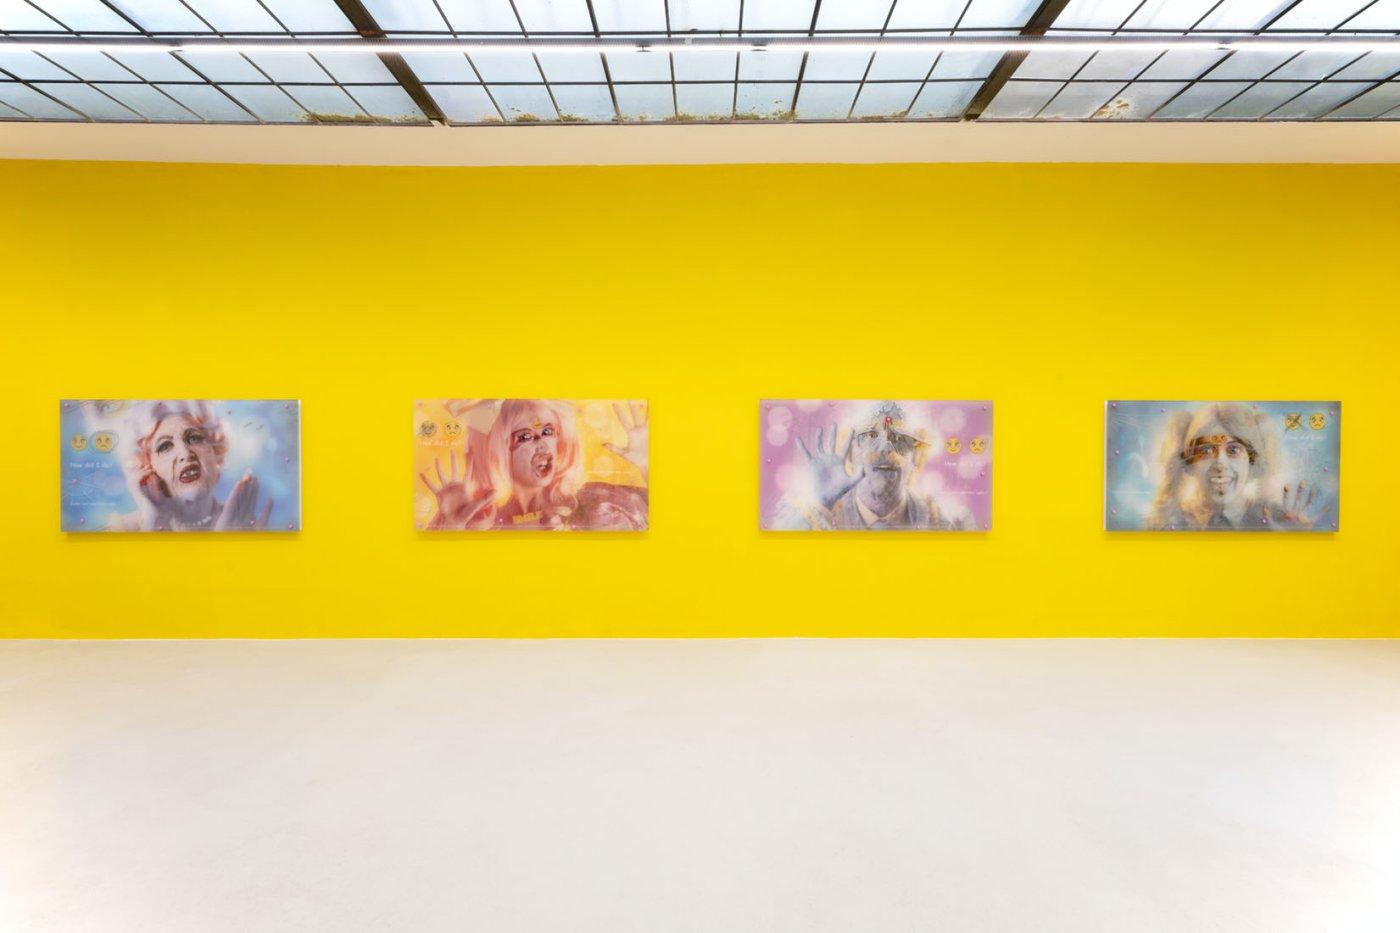 Galerie Kandlhofer Rachel Maclean new 2